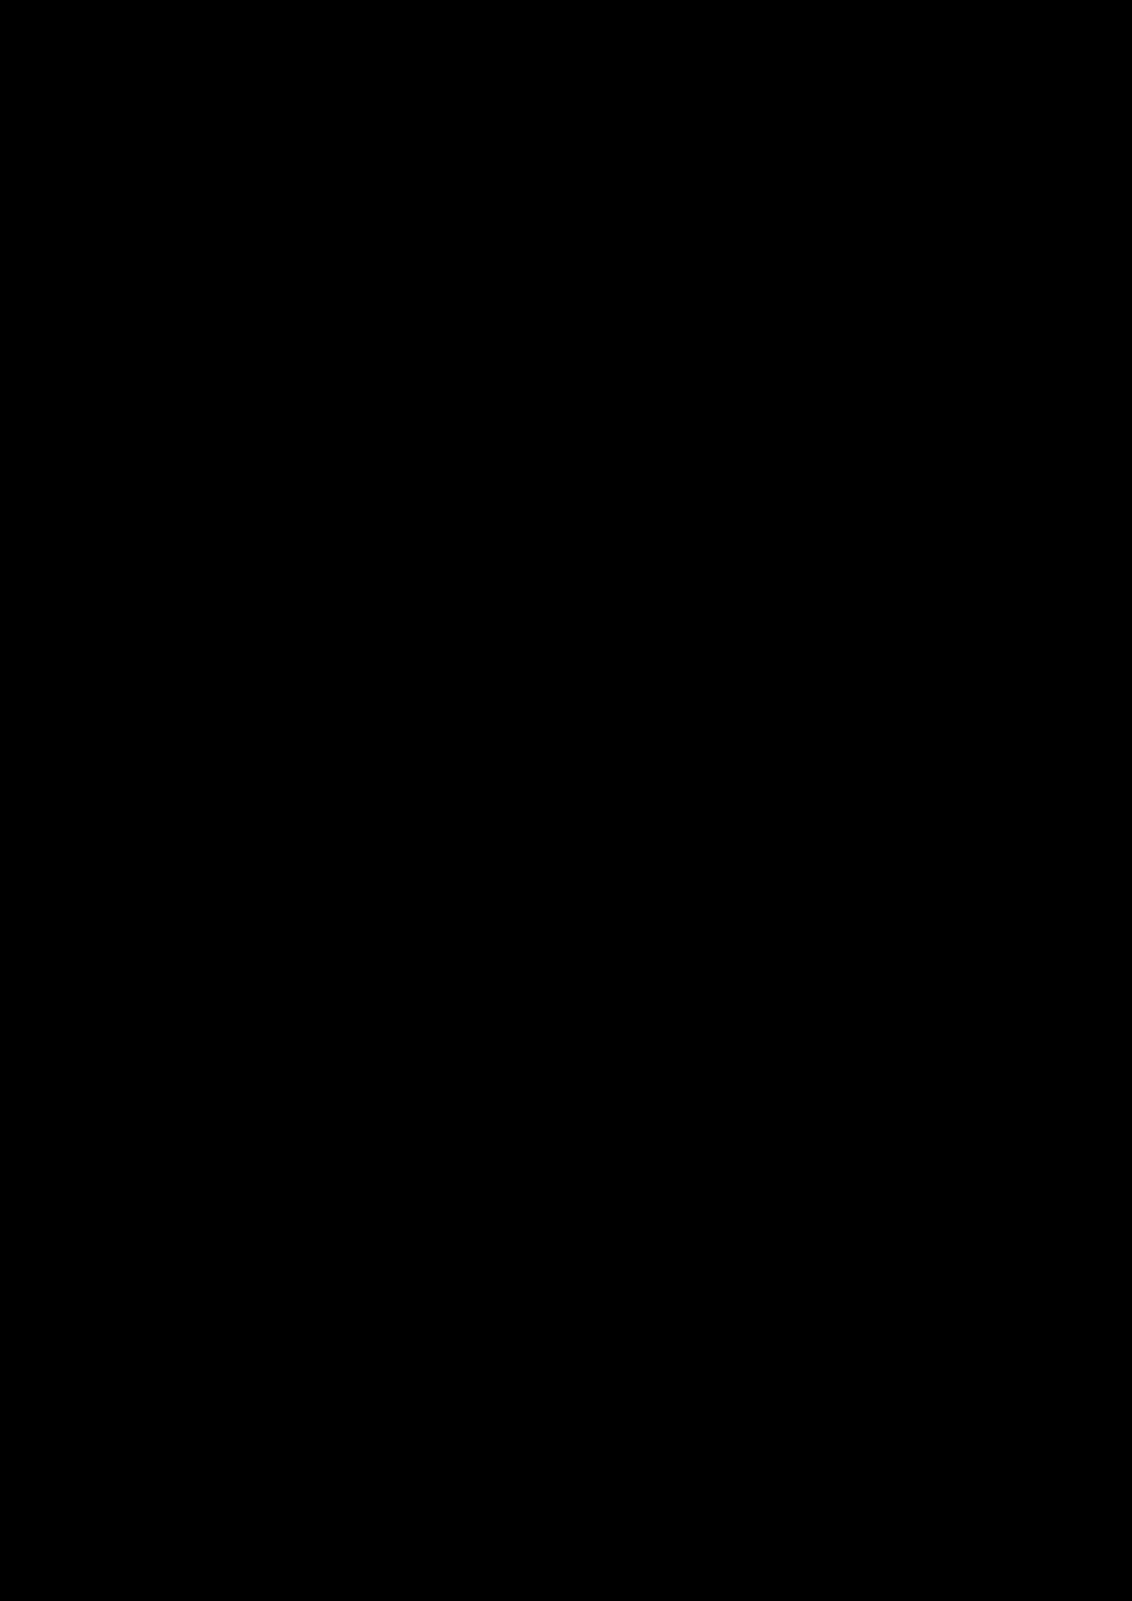 Korolevstvo slez slide, Image 9